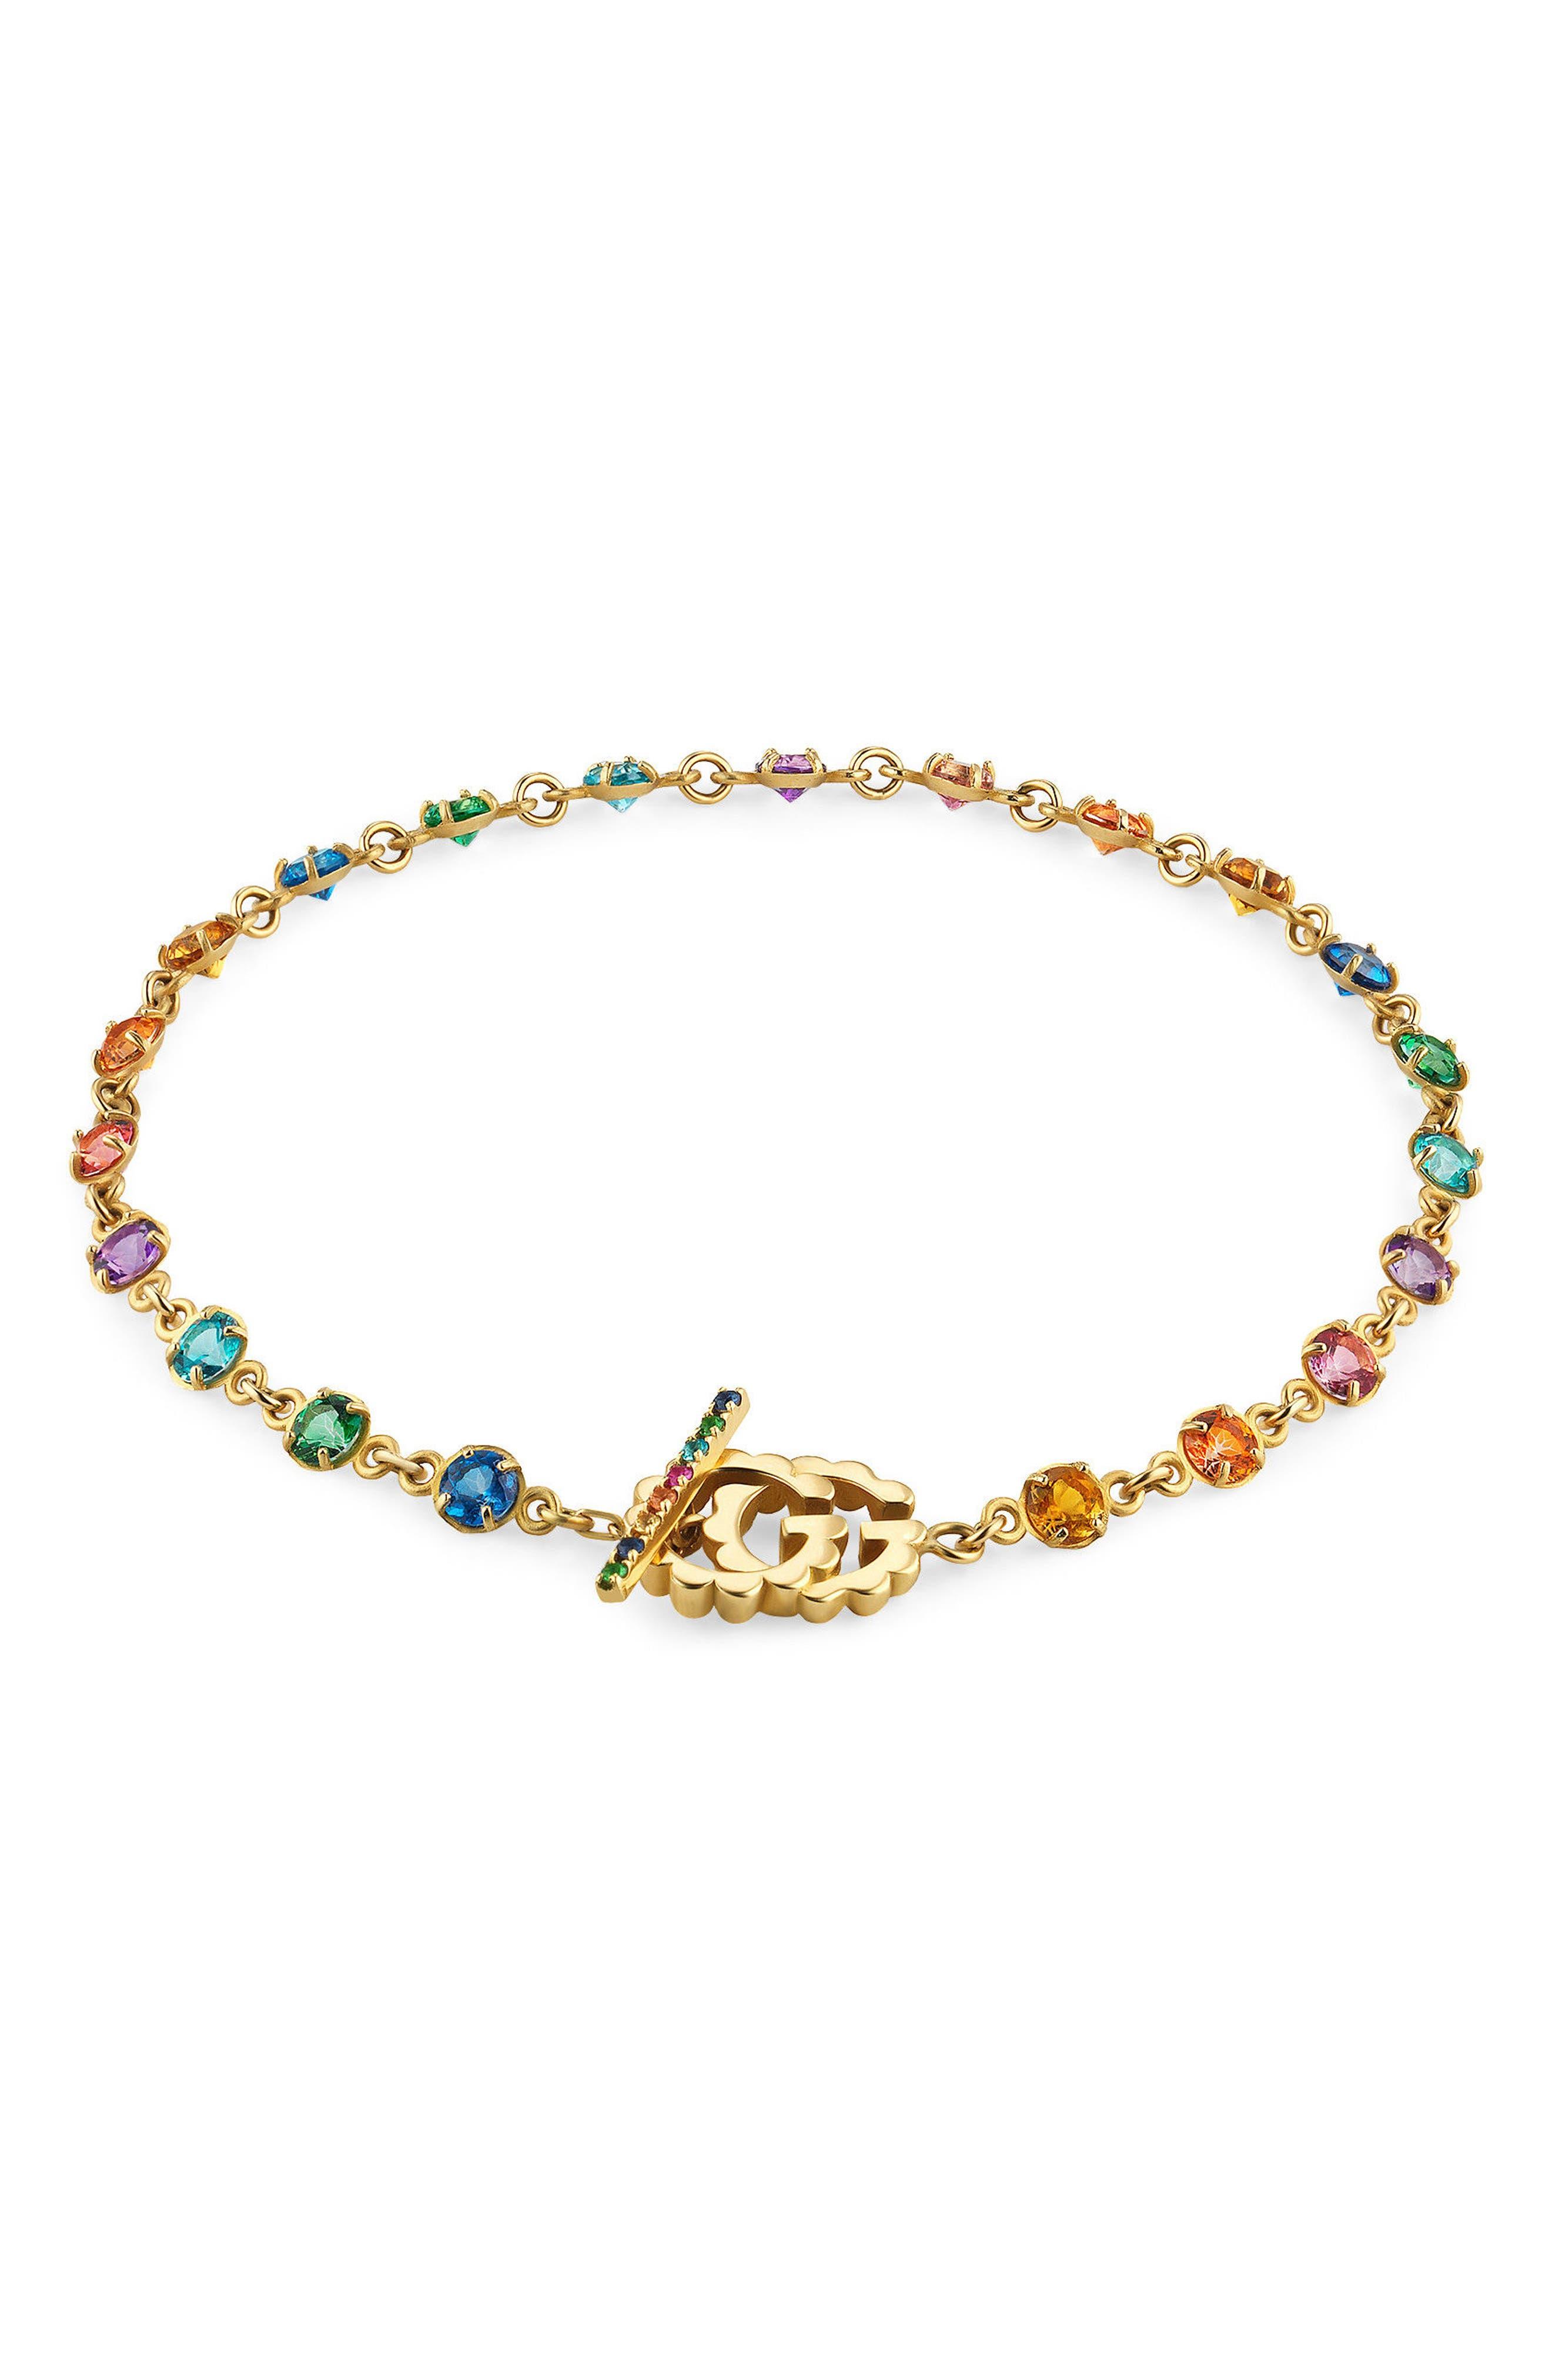 Running G Semiprecious Stone Linear Bracelet,                             Main thumbnail 1, color,                             YELLOW GOLD